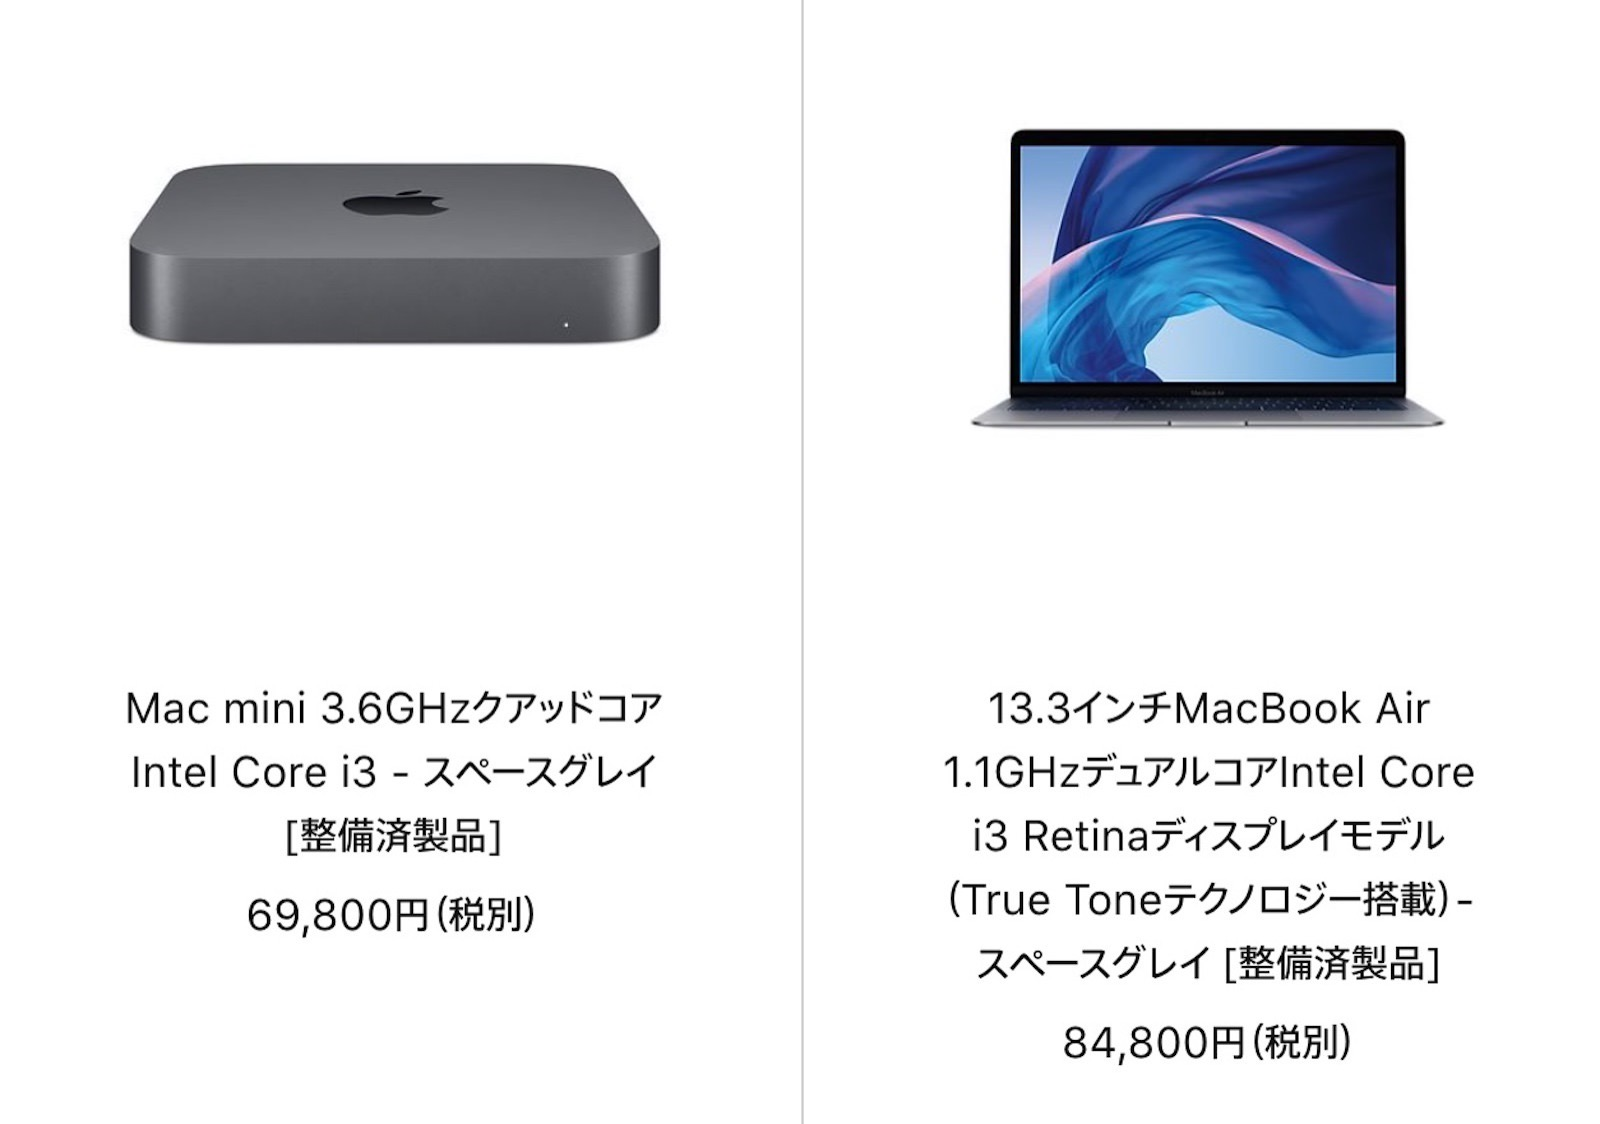 Mac mini refurbished model 20210301